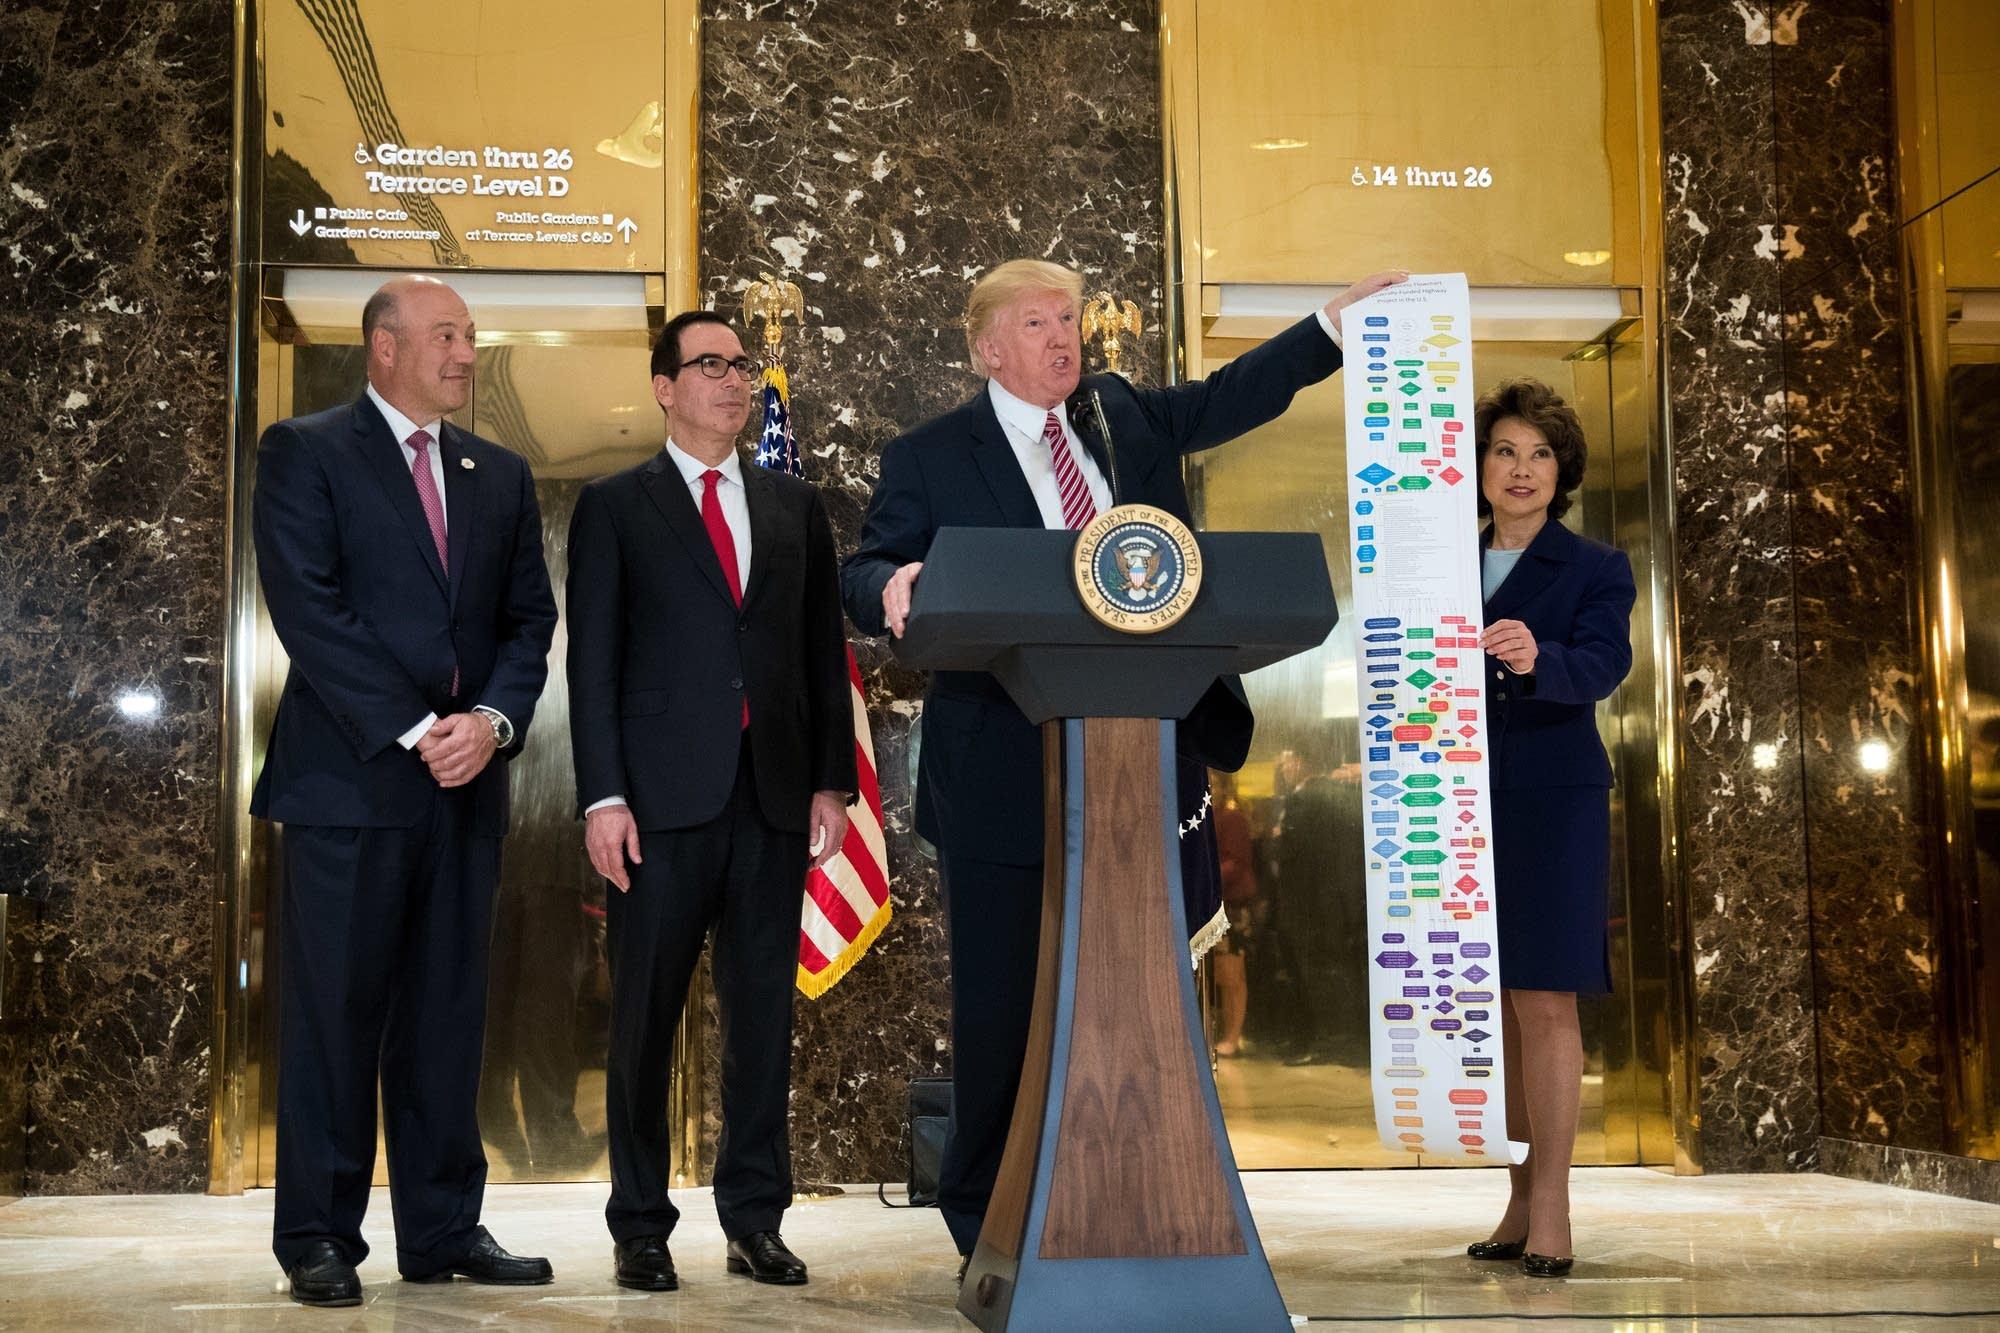 Gary Cohn, Steve Mnuchin, Donald Trump, Elaine Chao